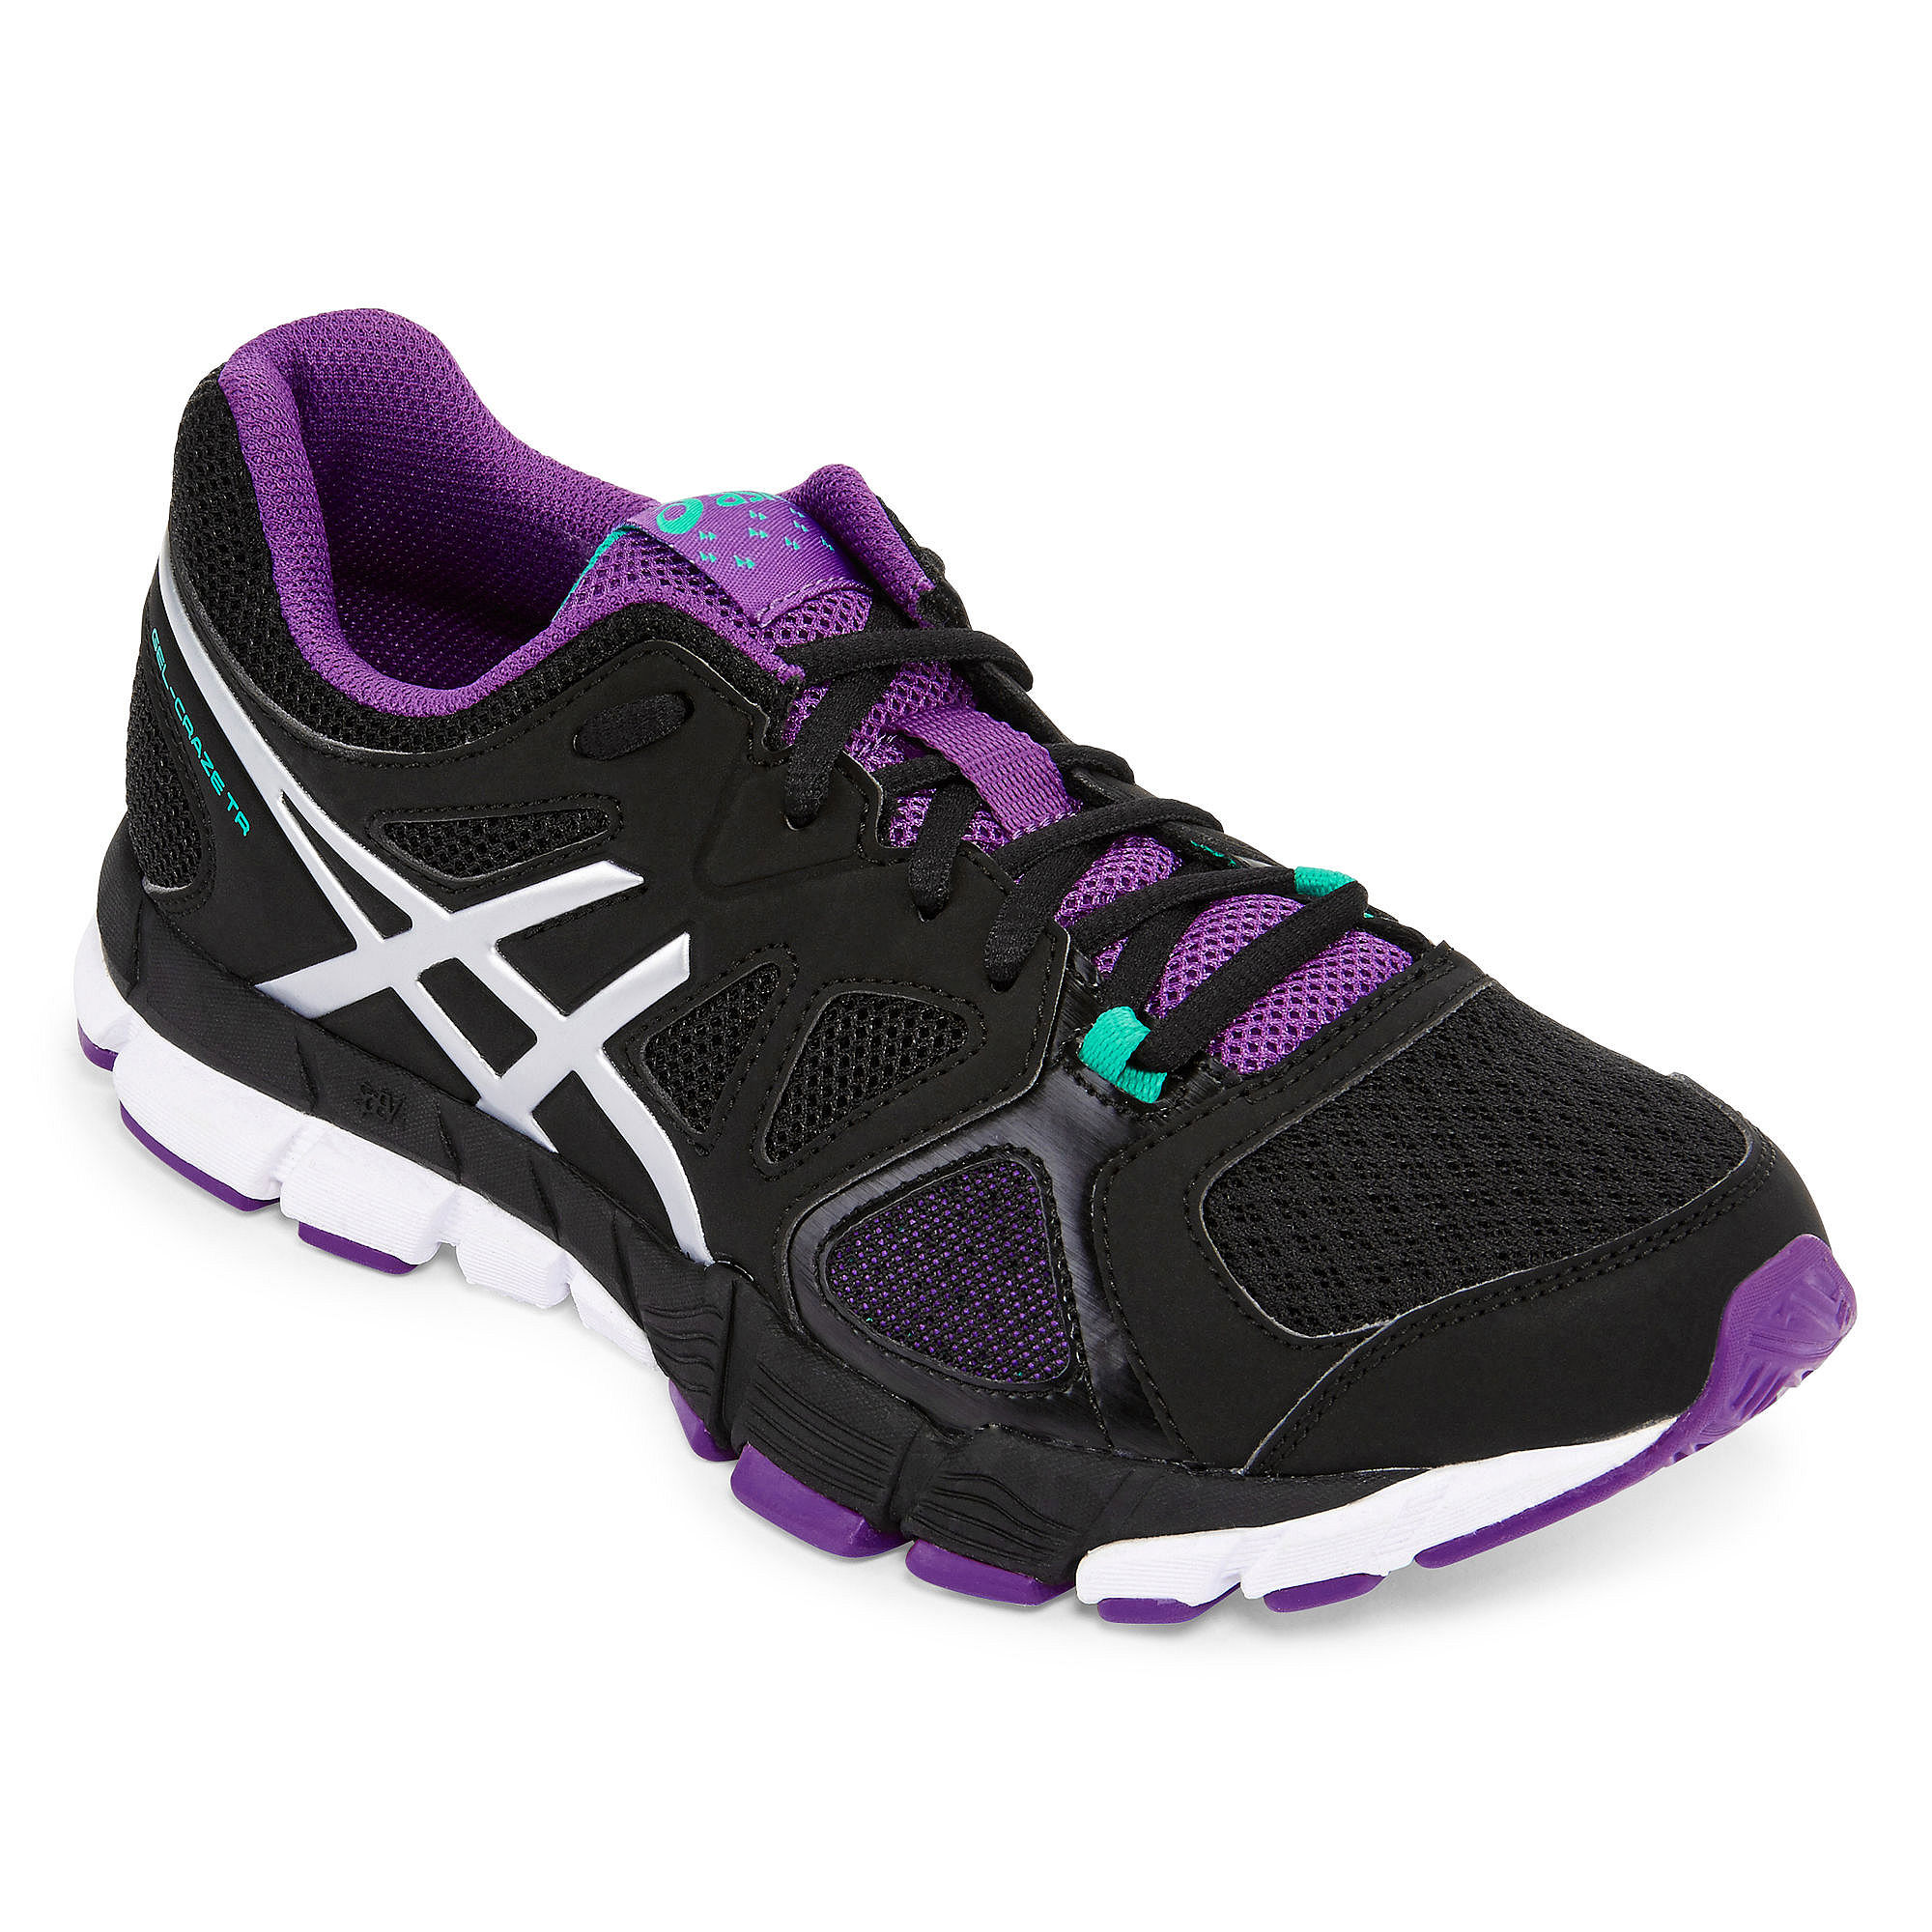 ASICS GEL-Craze TR 2 Womens Training Shoes